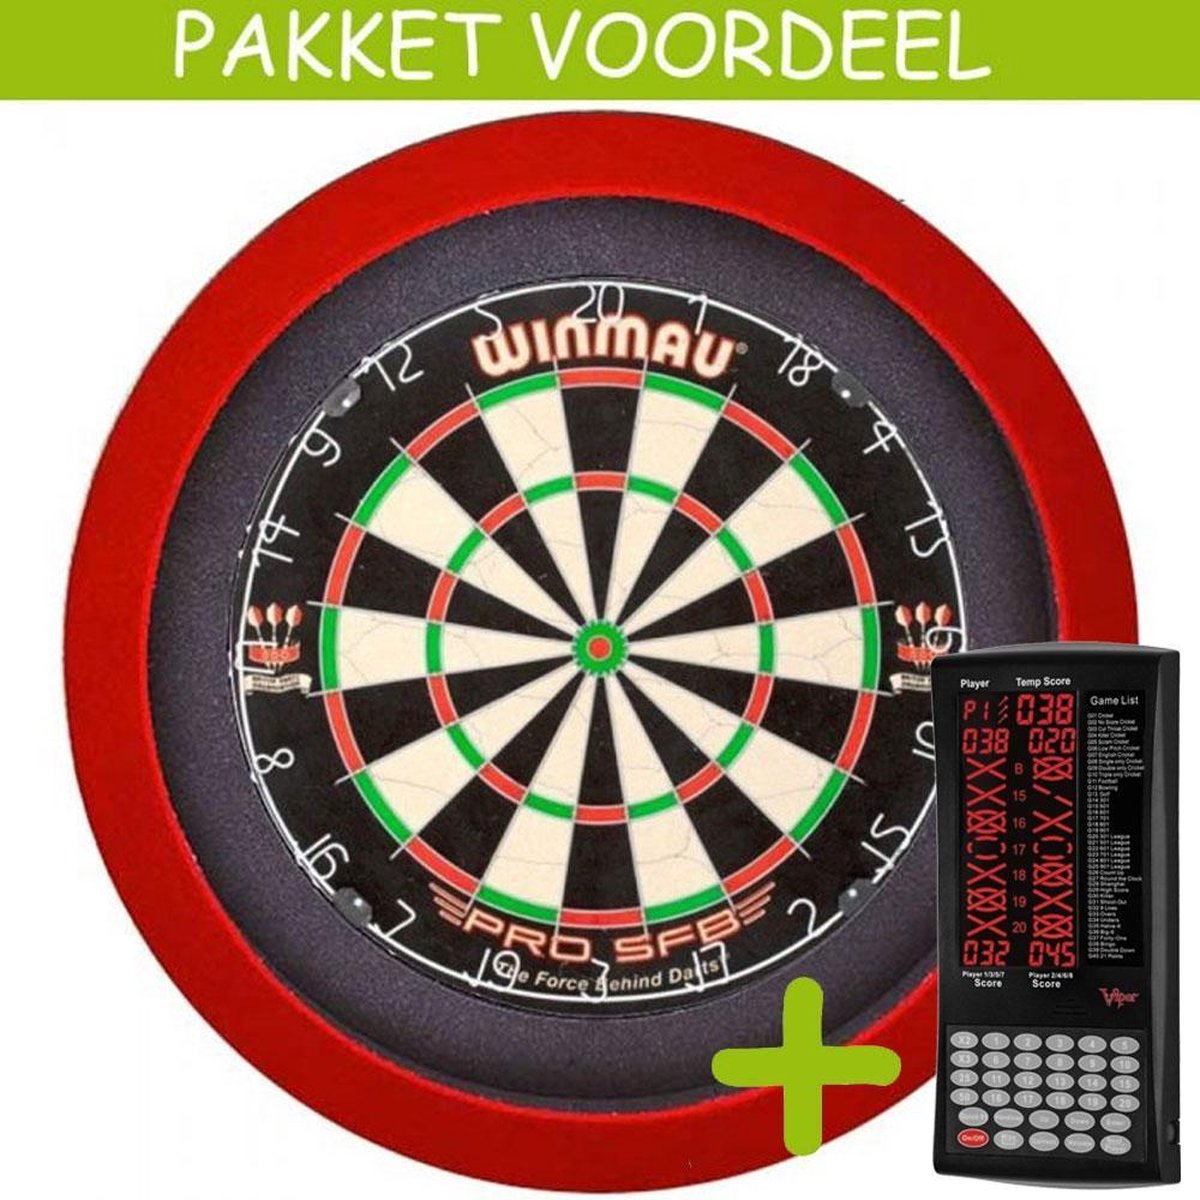 Elektronisch Dart Scorebord VoordeelPakket (Viper ) - Pro SFB - Dartbordverlichting Basic (Rood)